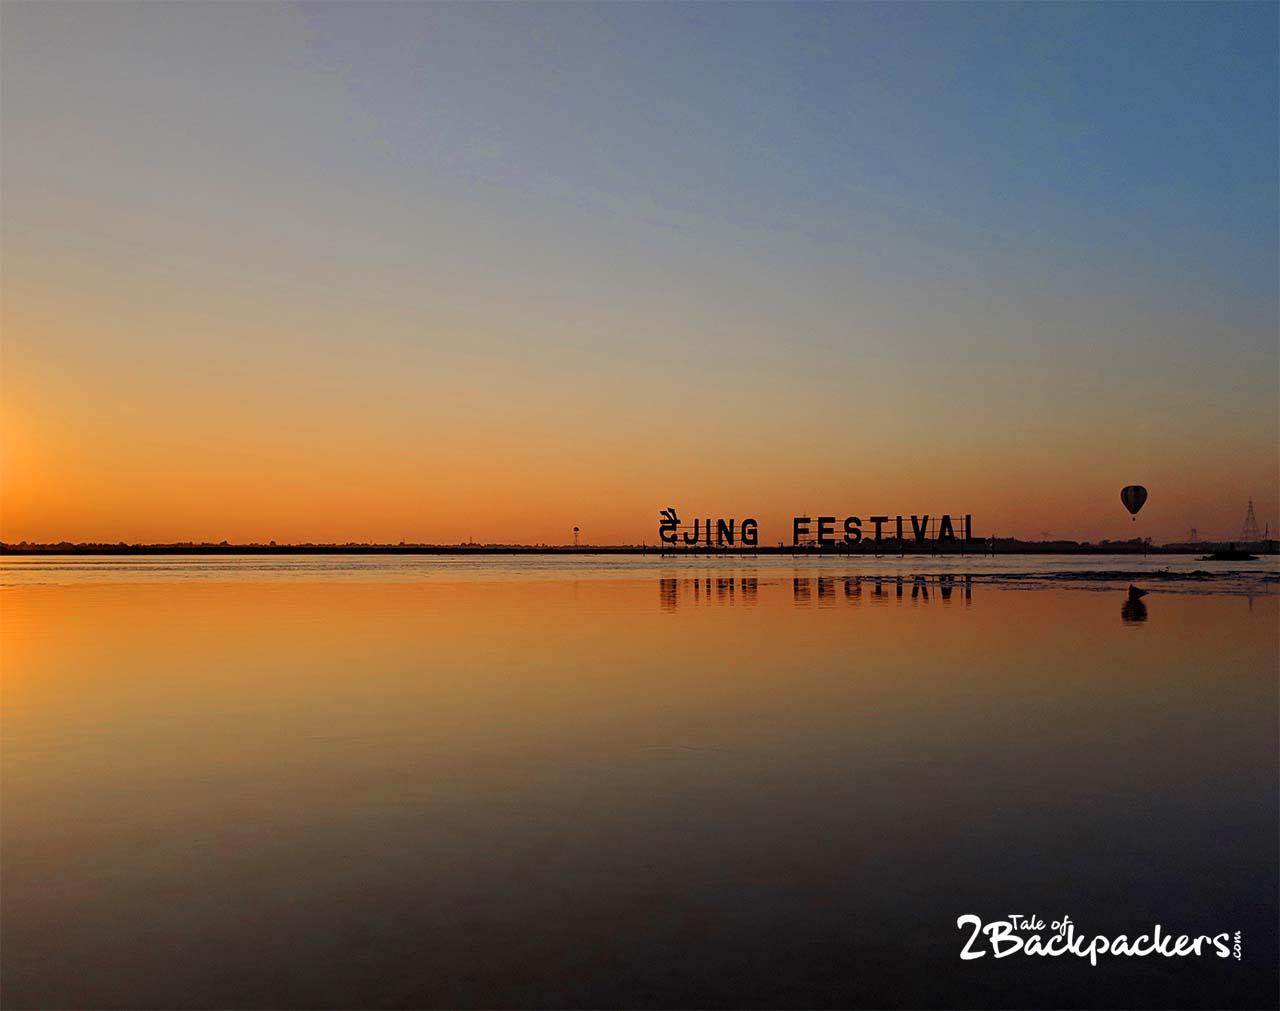 Dwijing Festival, Bodoland. Assam Tourism